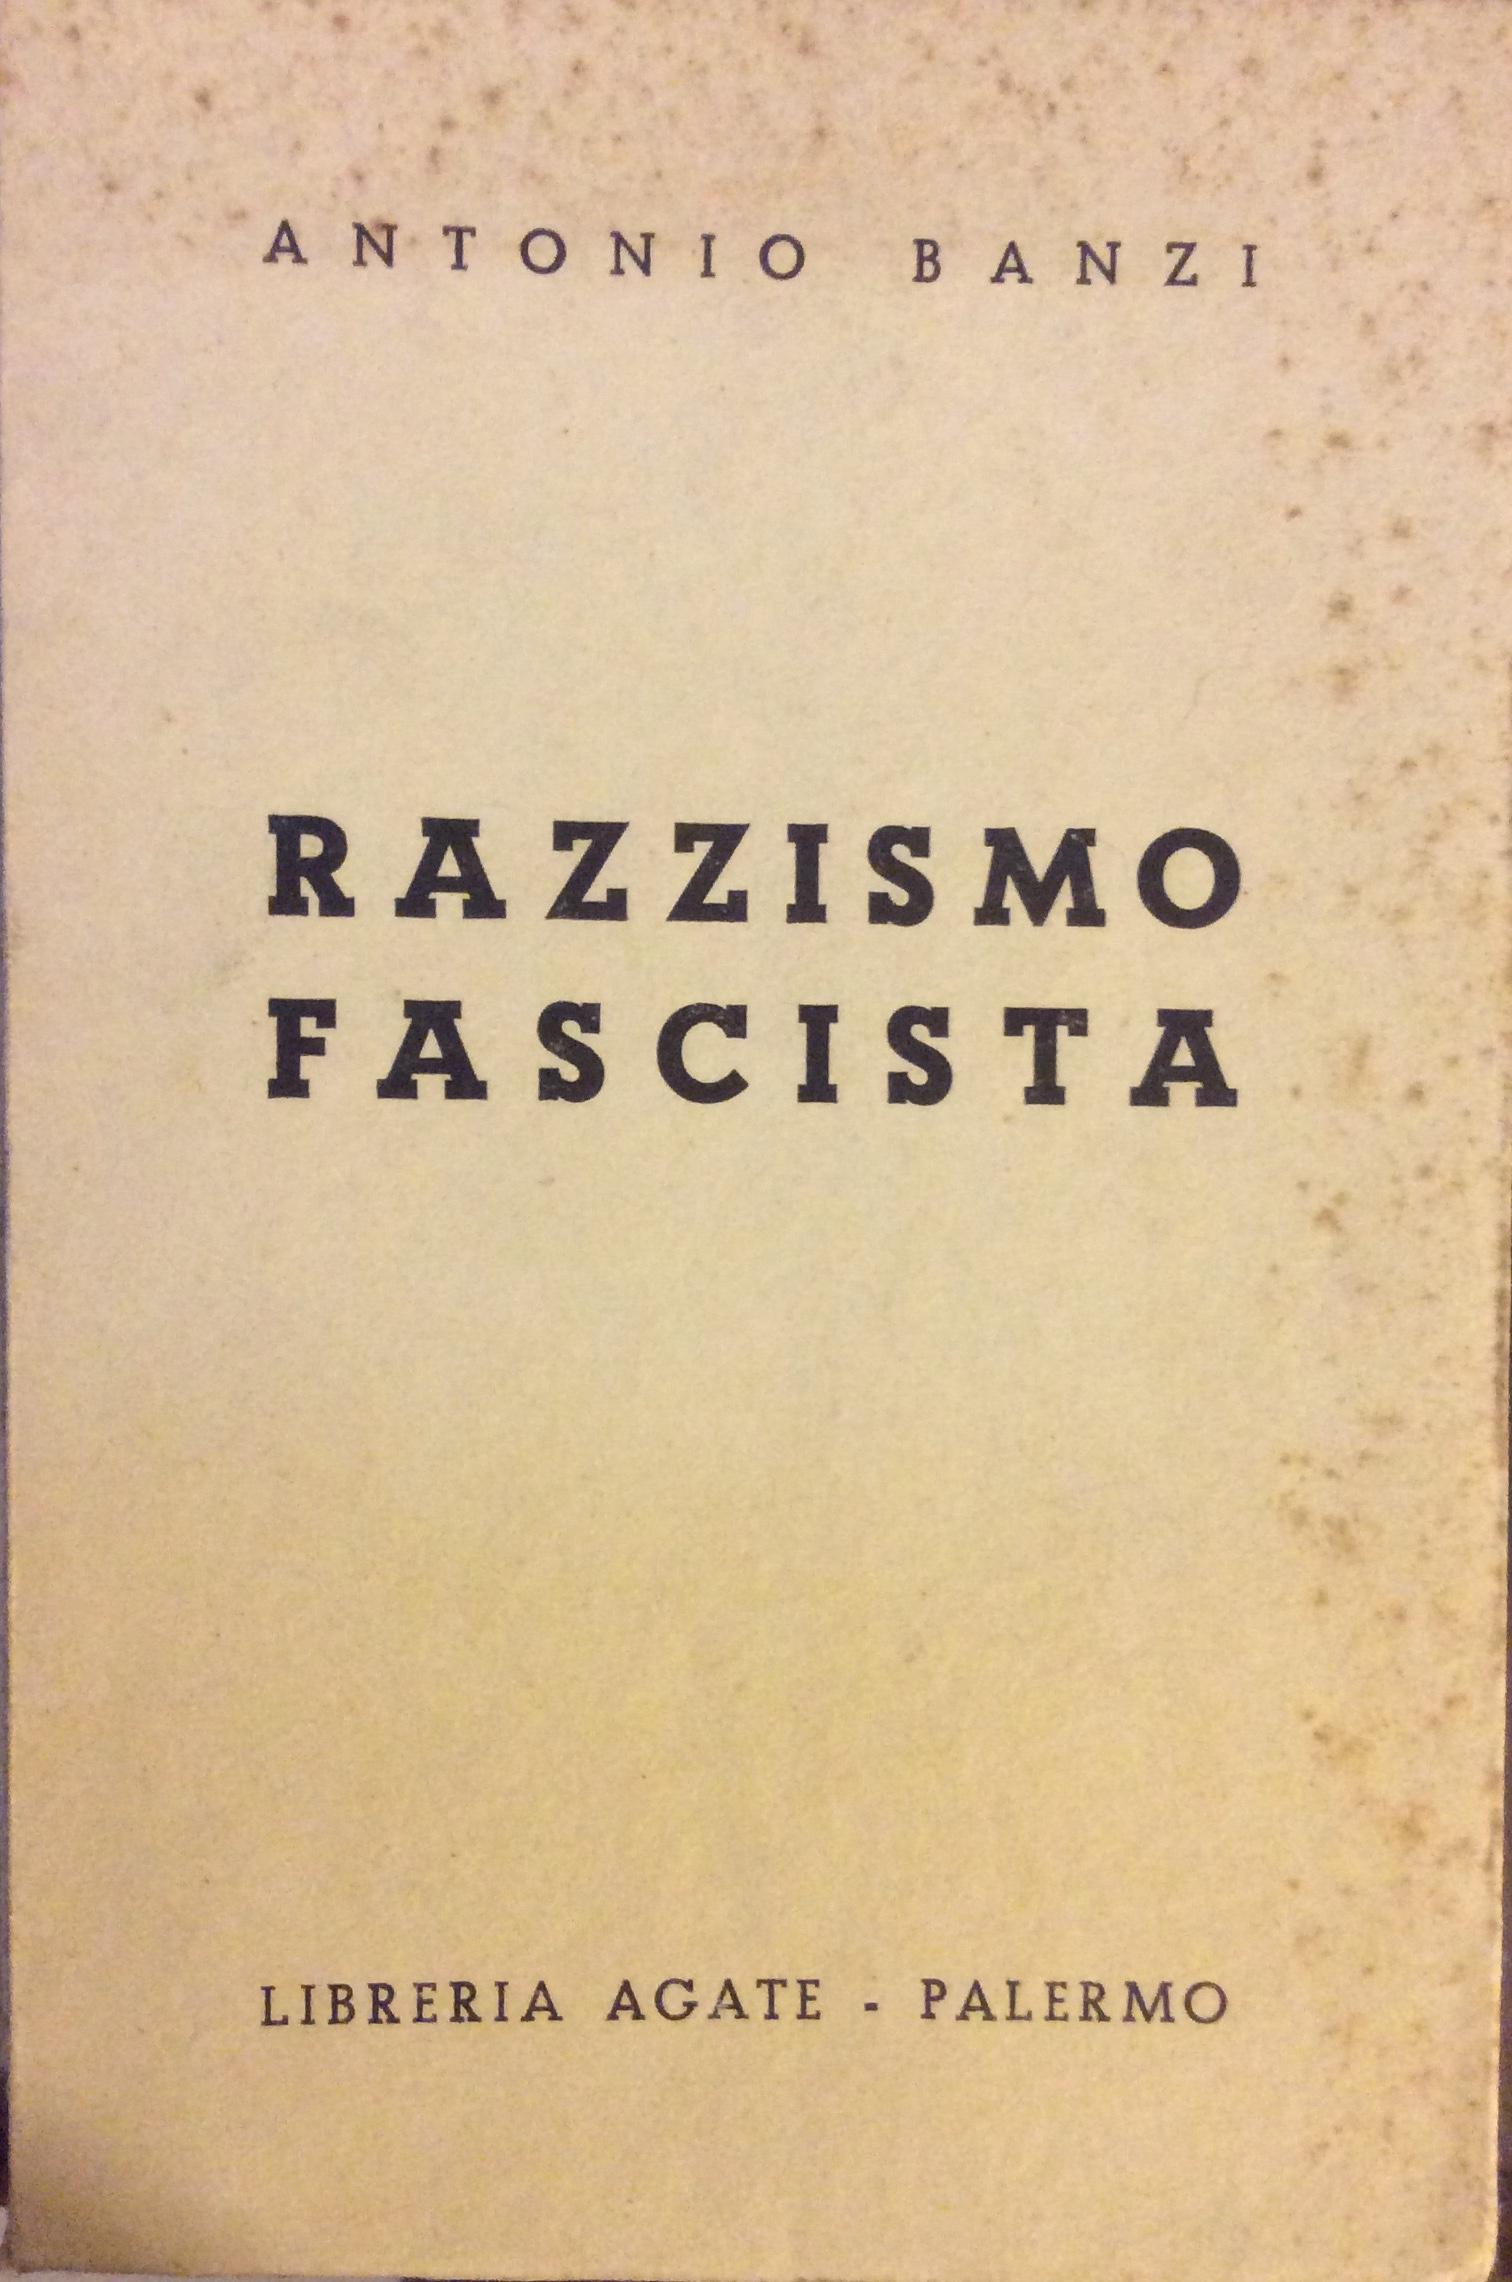 Razzismo fascista